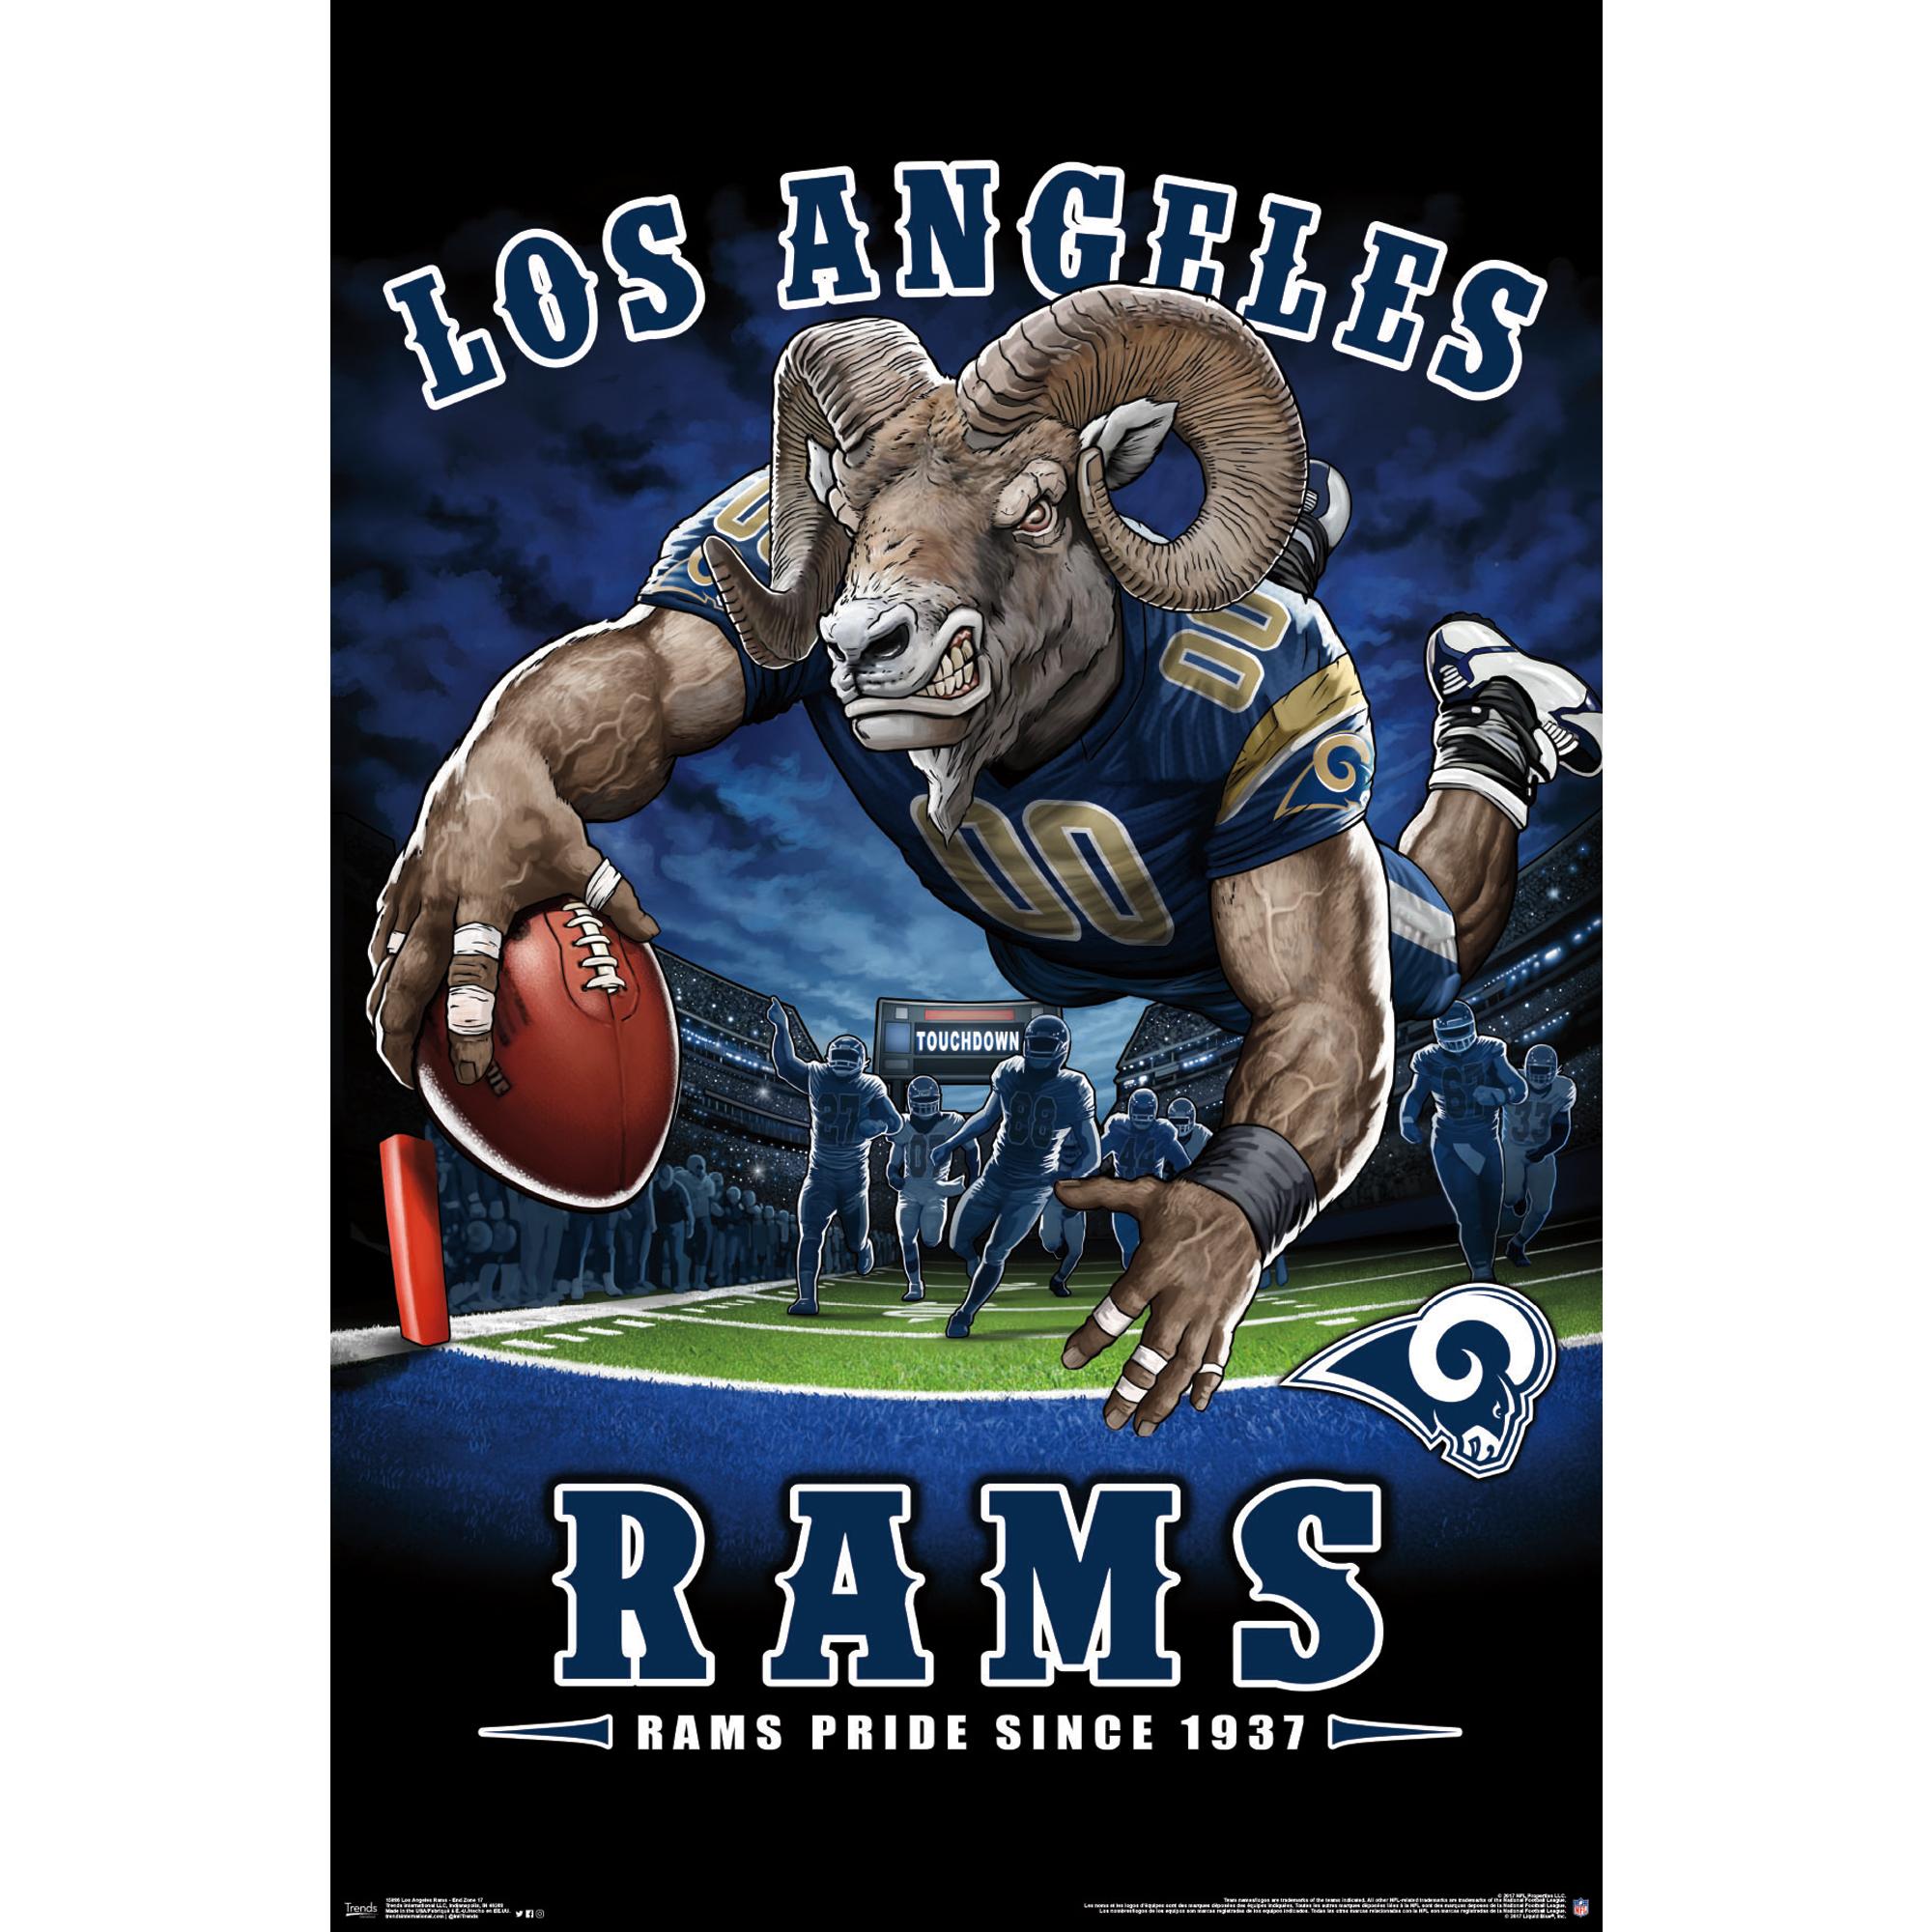 Los Angeles Rams Liquid Blue Designs 22'' x 34'' End Zone Poster - No Size